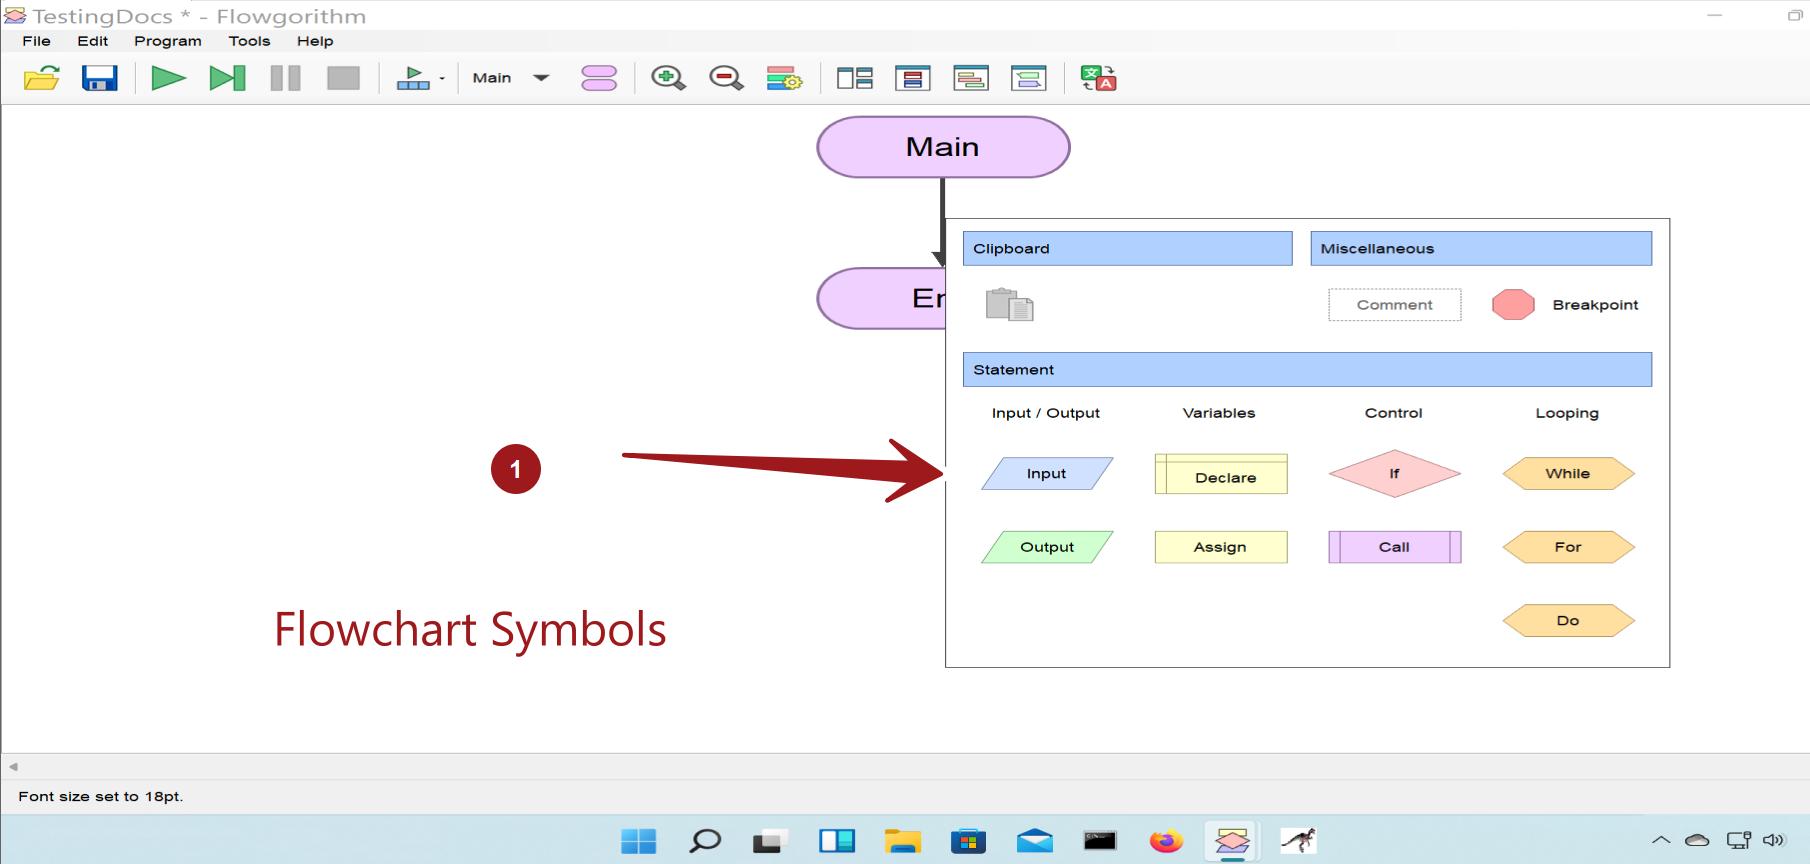 Flowgorithm Flowchart Symbols